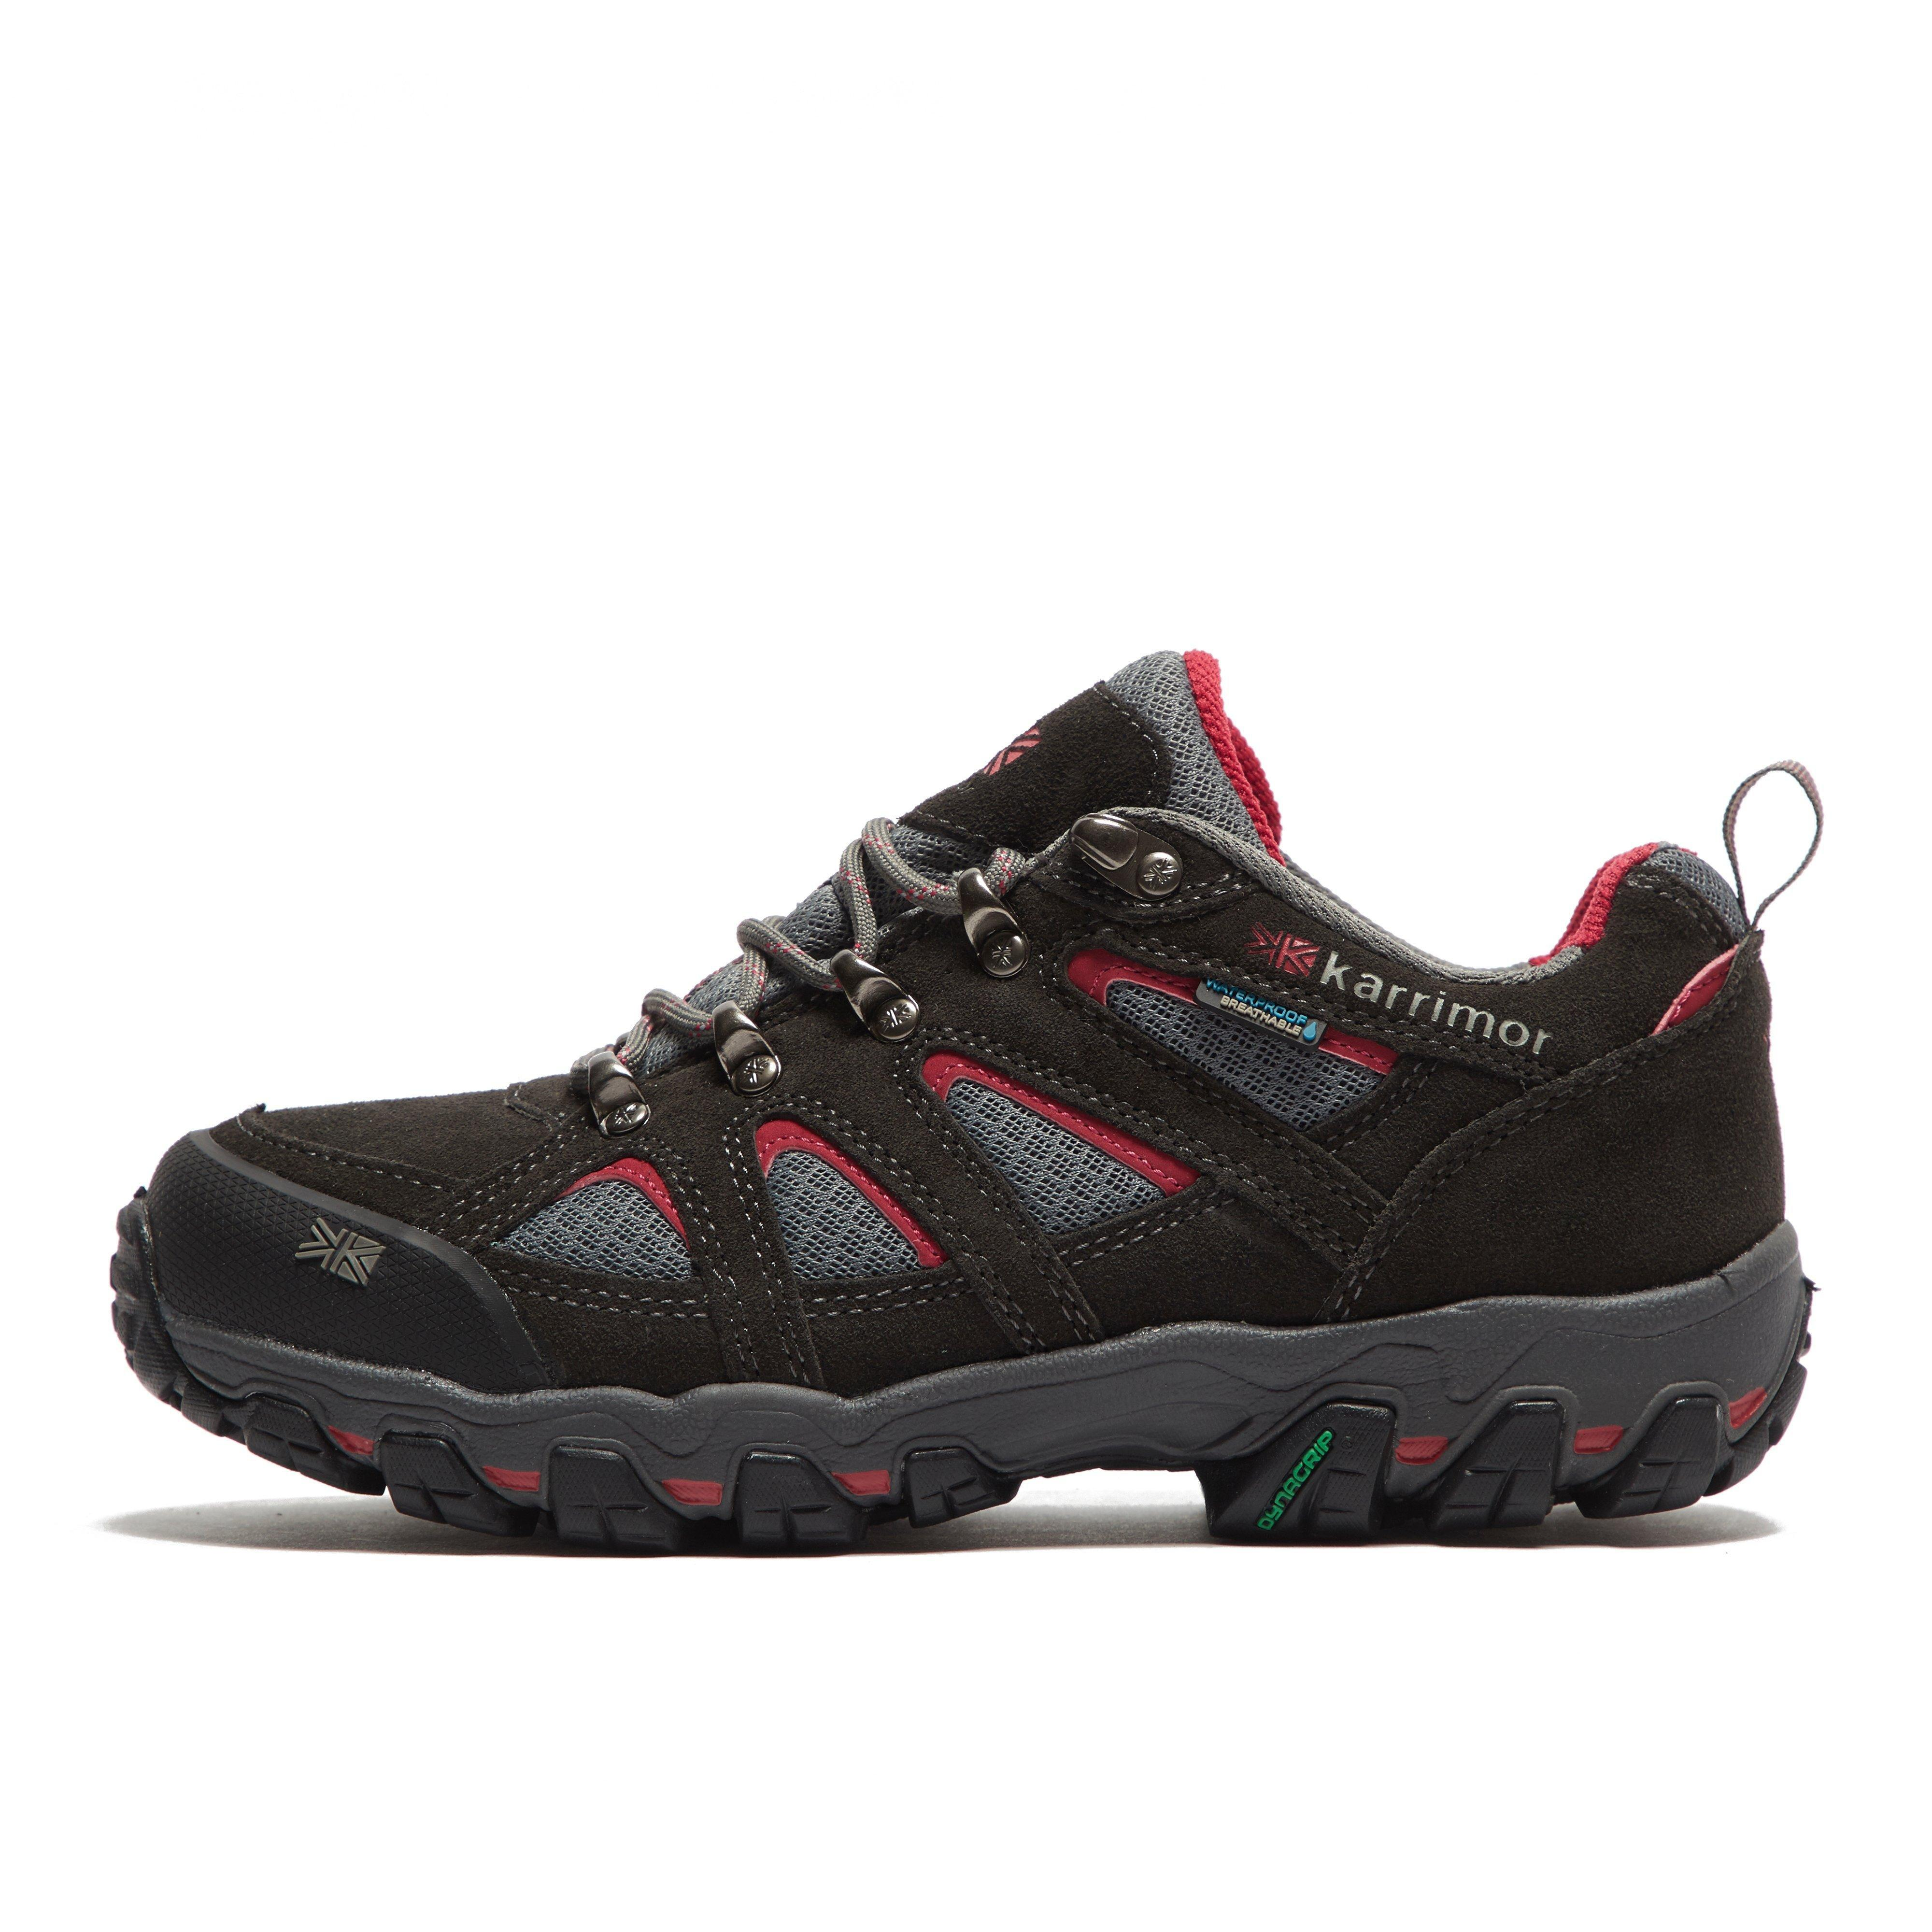 Karrimor Women's Bodmin 5 Walking Shoe - Grey/Dgy, Grey